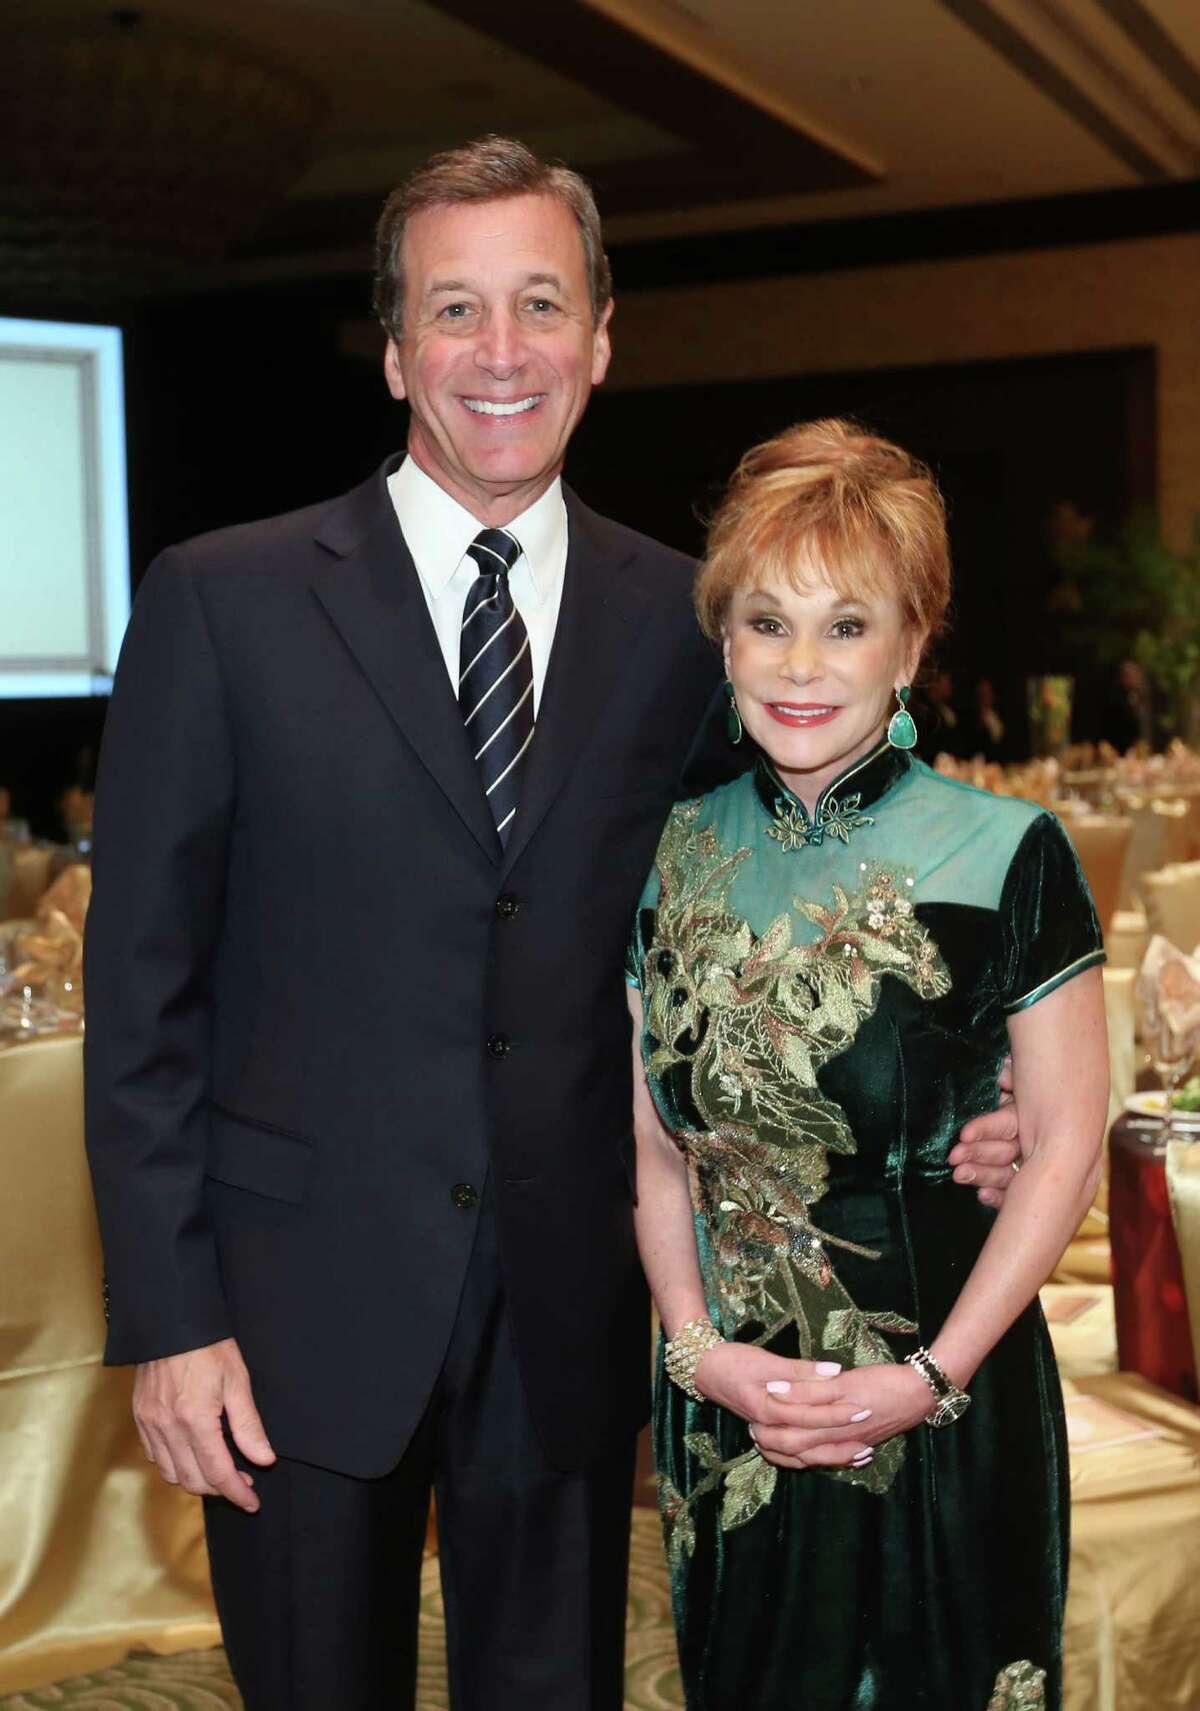 Jack and Nancy Dinerstein